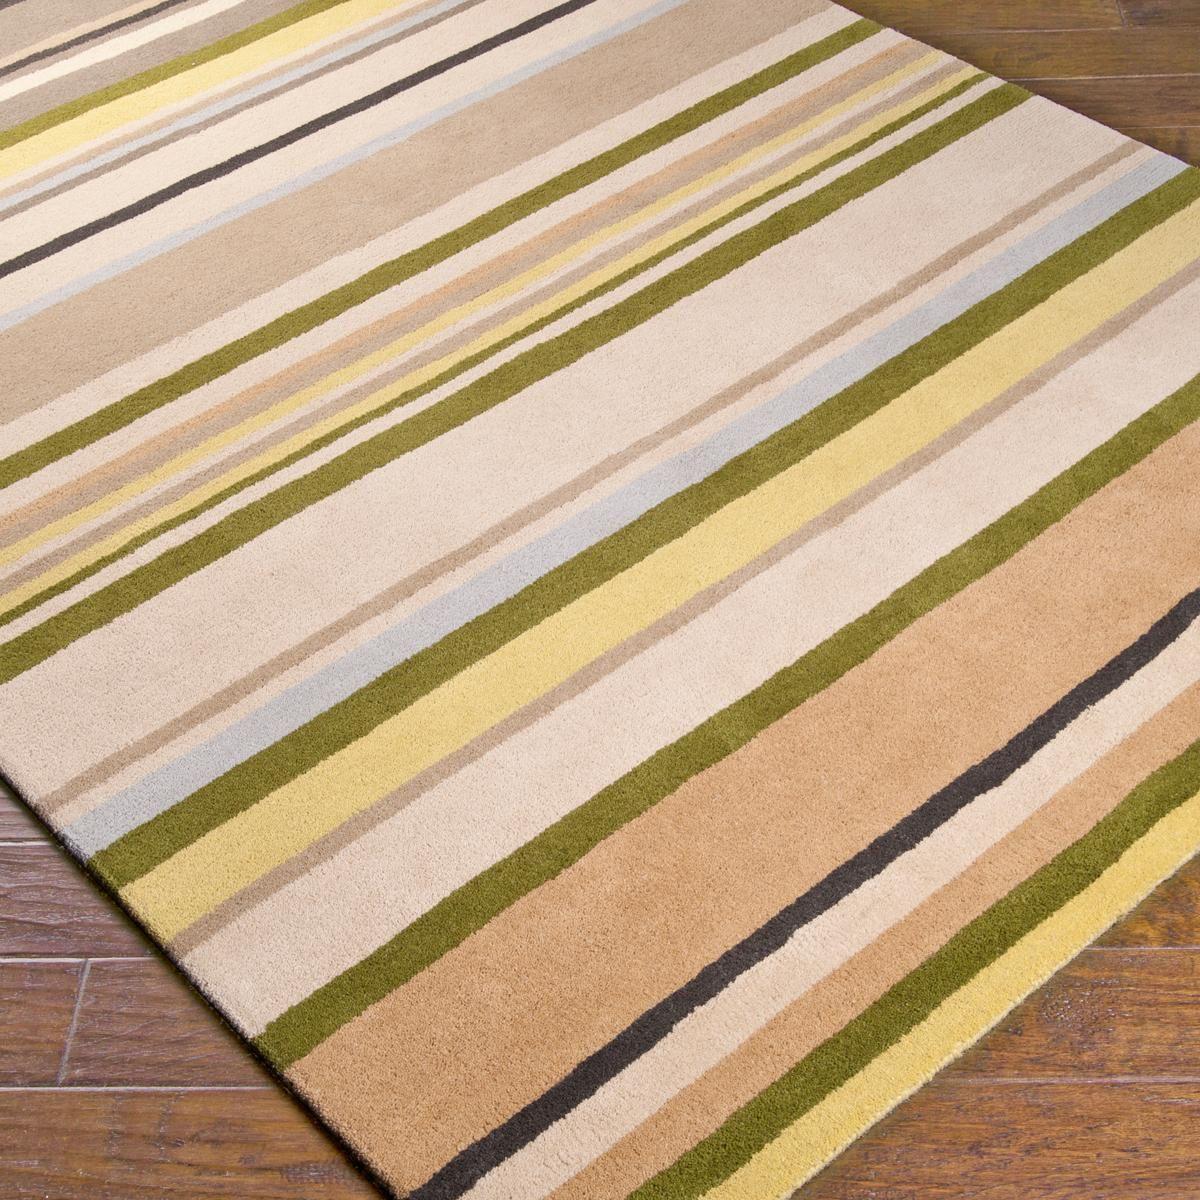 Plush Wool Pile Terrestrial Stripe Rug In Khaki Cream